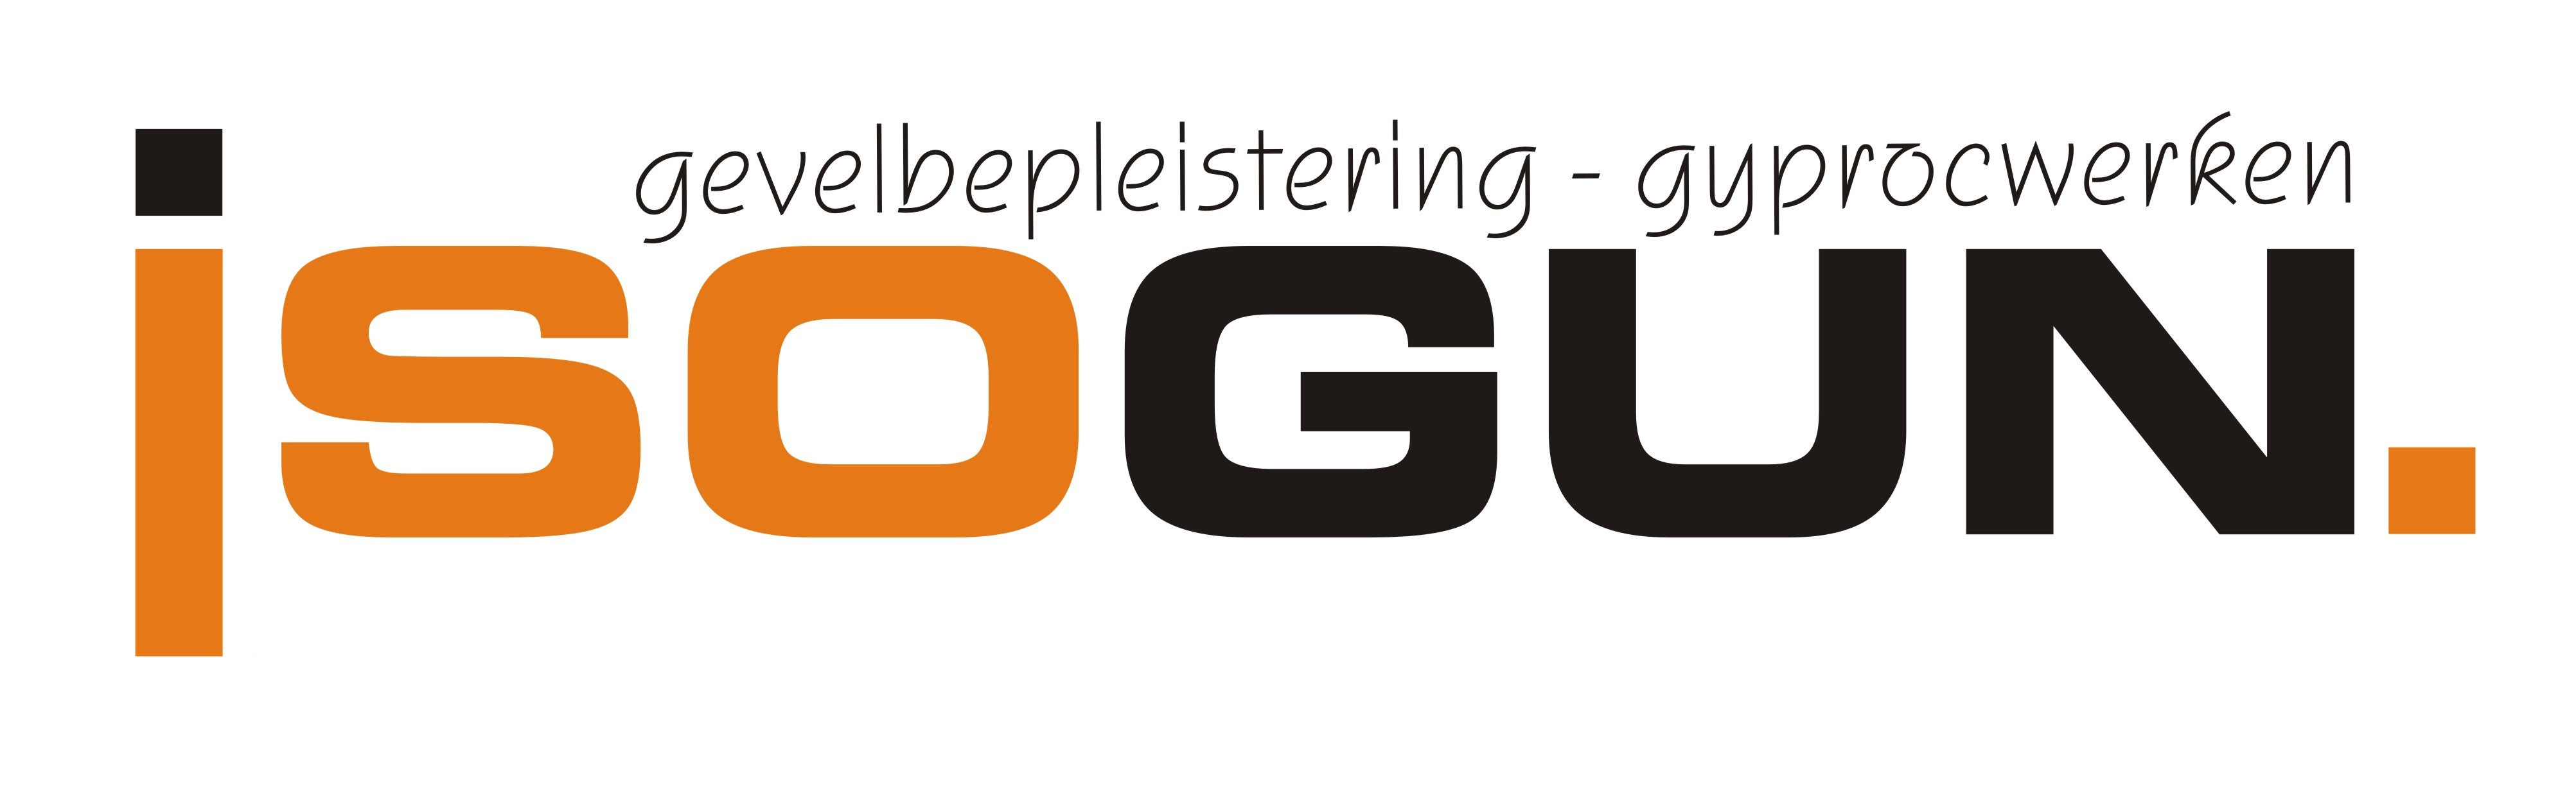 ISOGUN Gevelbepleistering